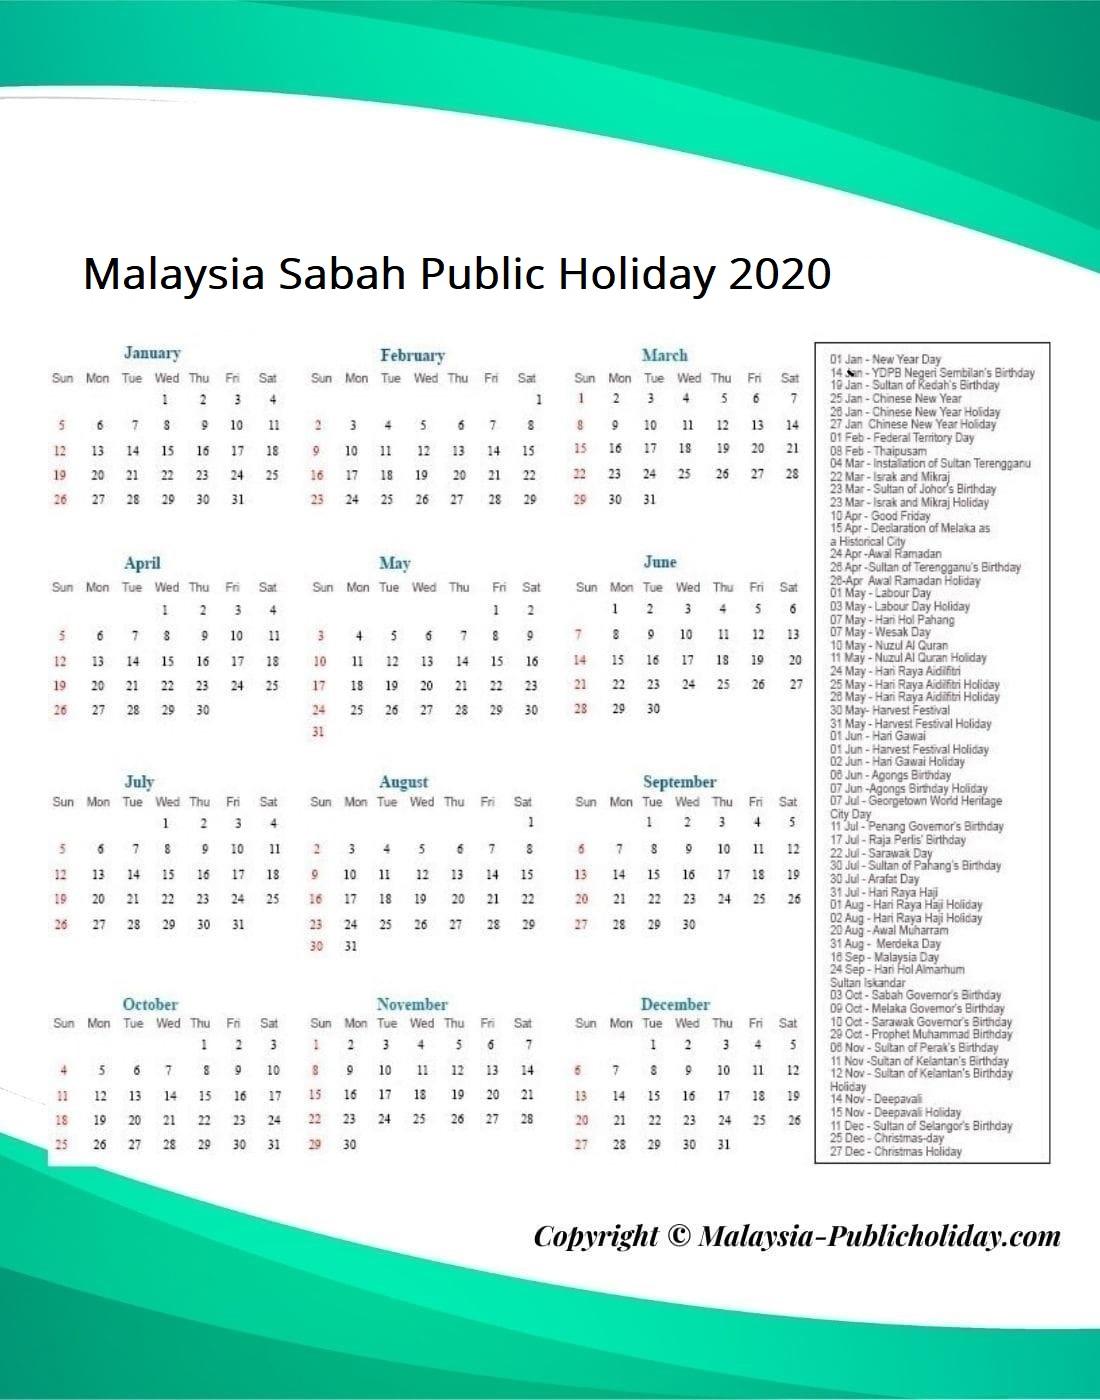 Sabah Public Holiday 2020